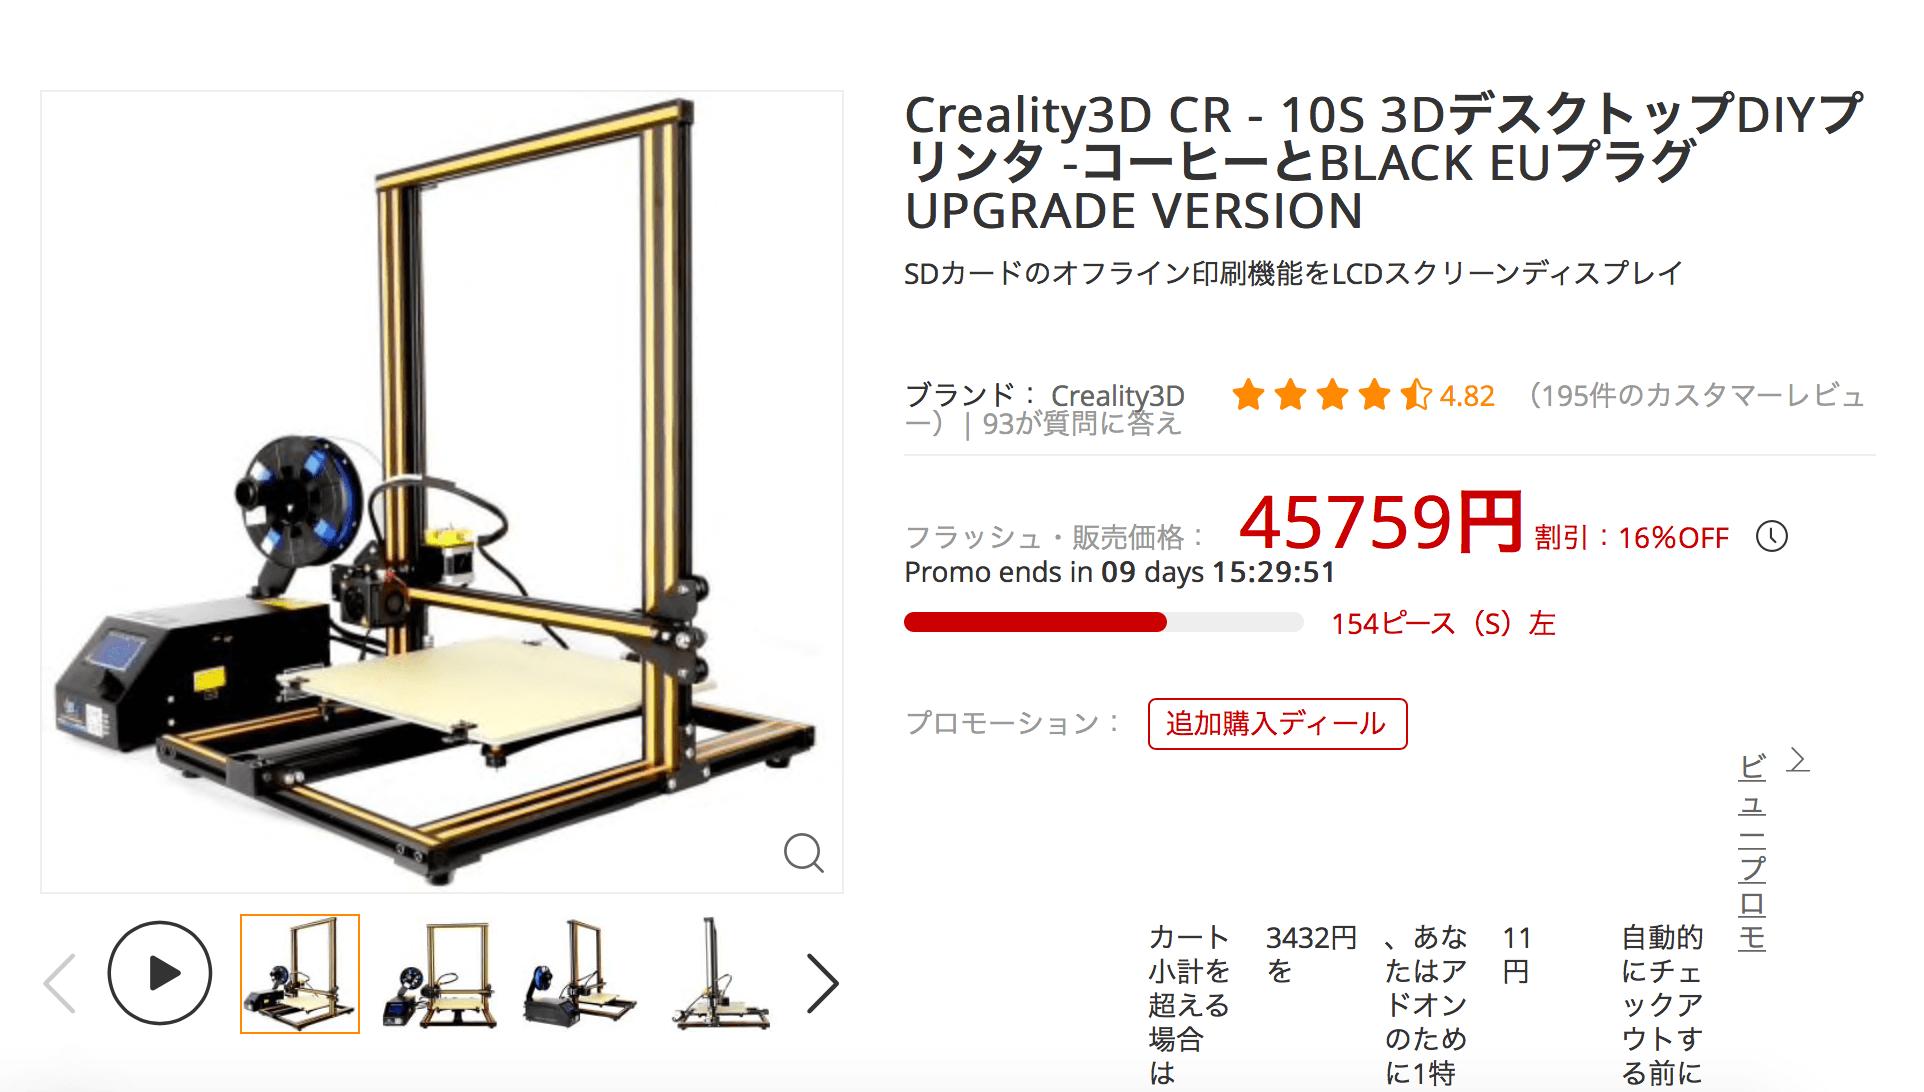 GearBestの商品ページのスクショ画像